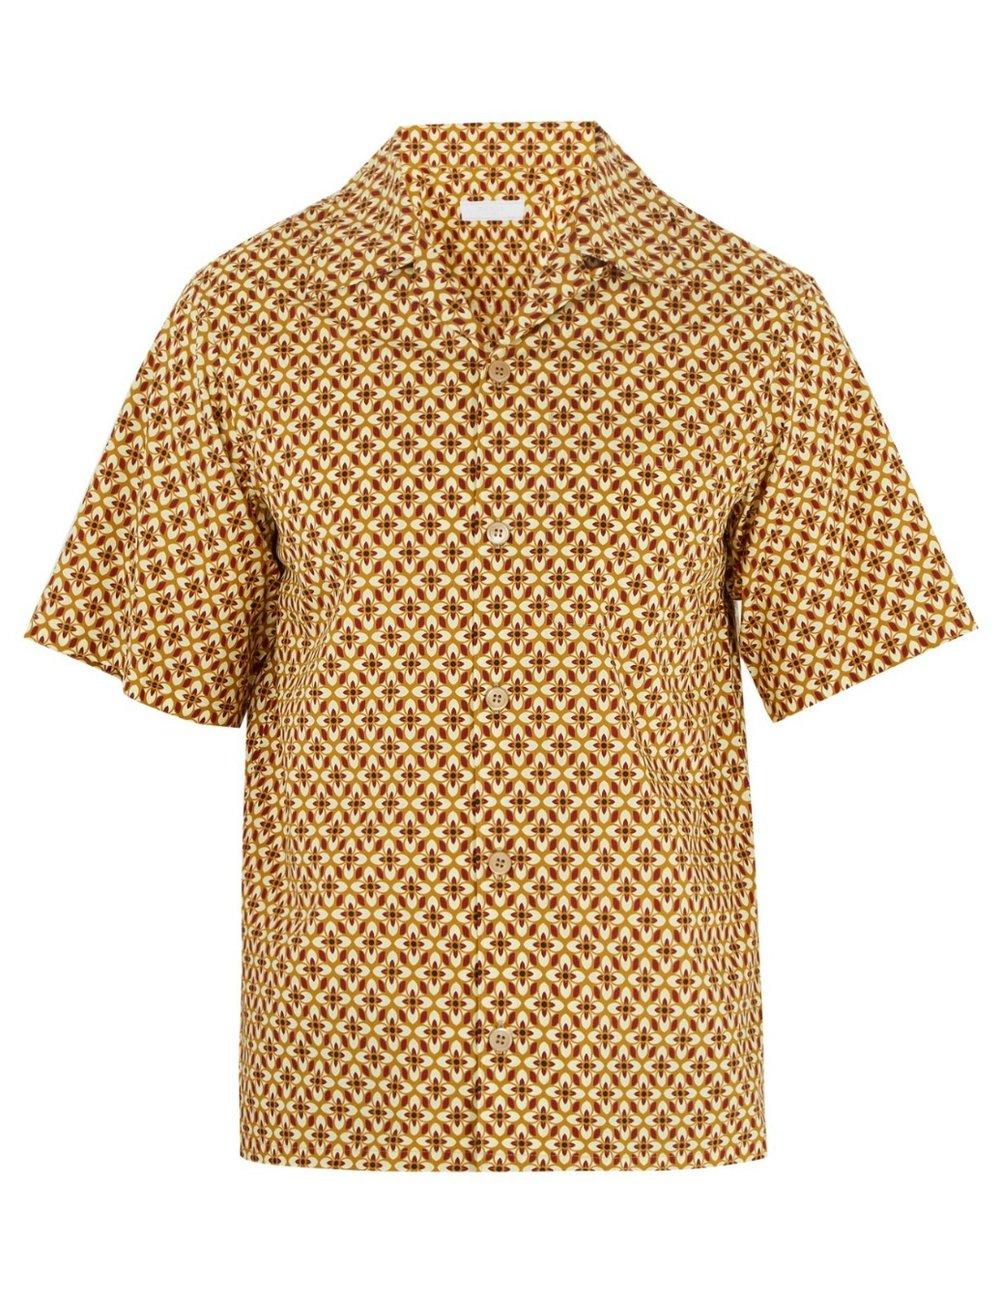 PRADAFloral-print cotton shirt - MATCHESFASHION.COM